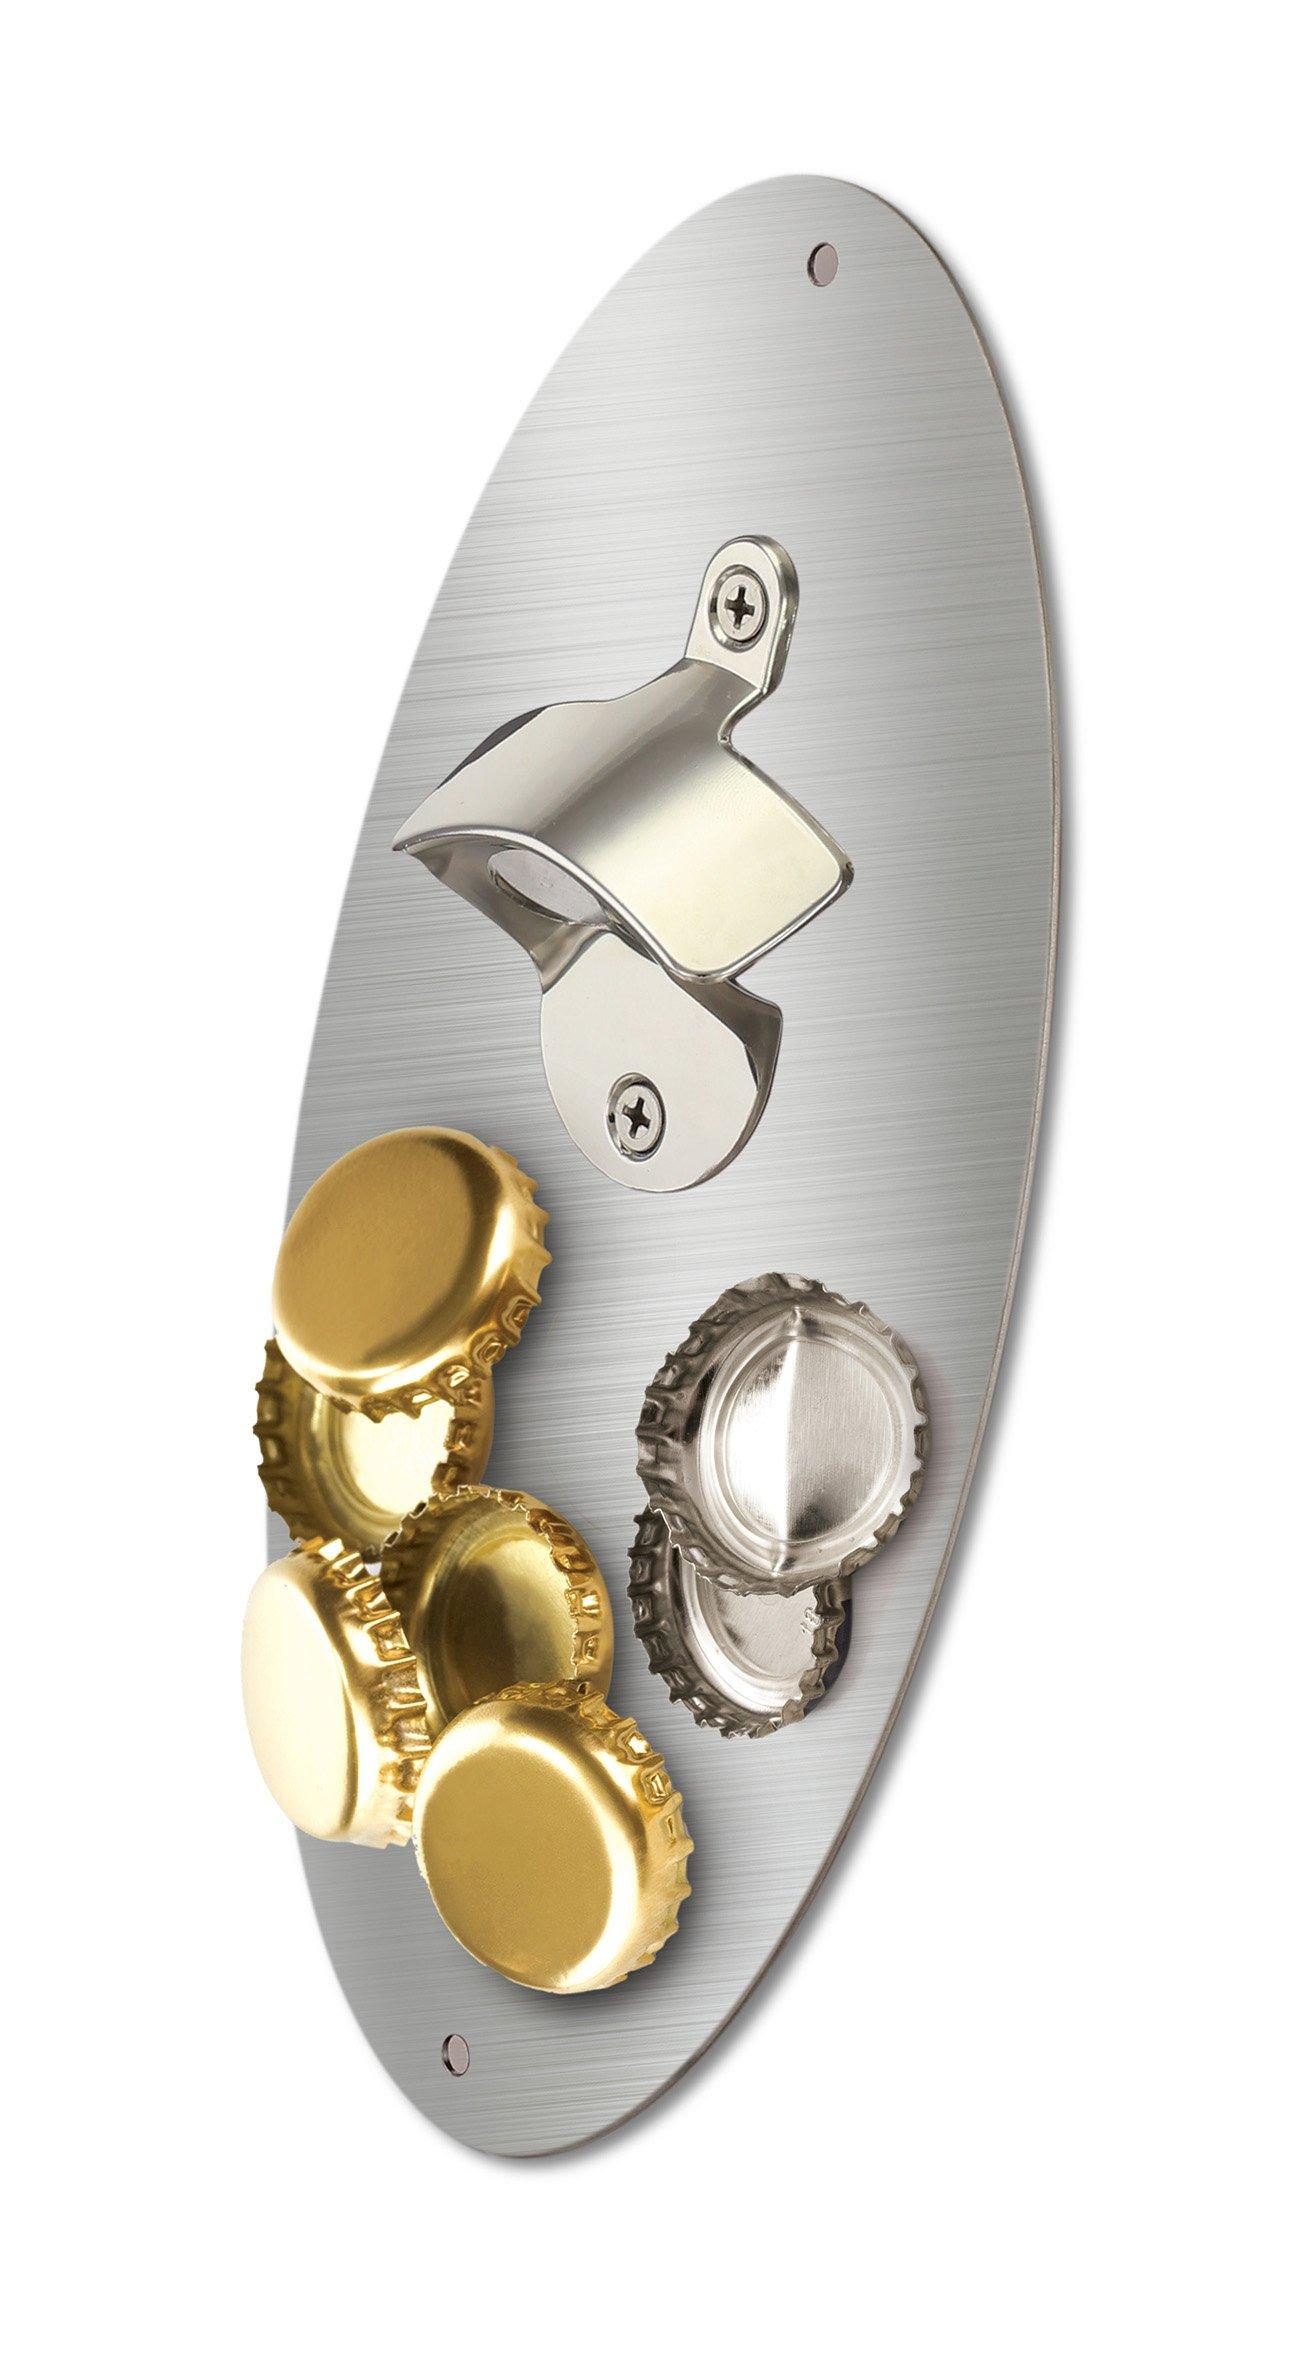 KOVOT Magnetic Bottle Opener With Magnetic Cap Catcher - 10'' x 5''